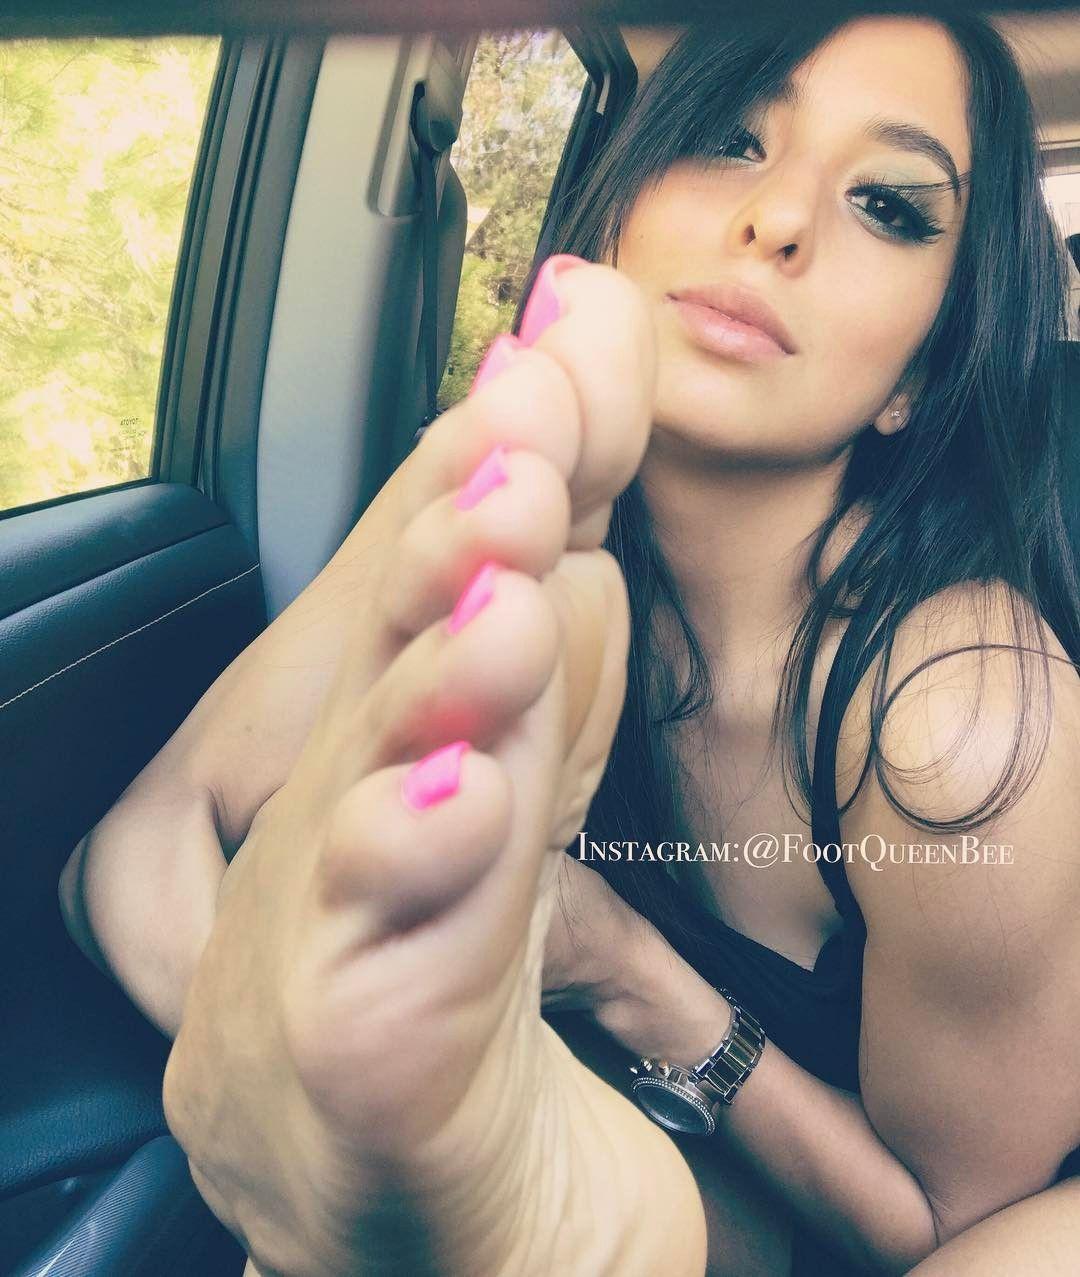 Teen feet scott nails | Adult pics)